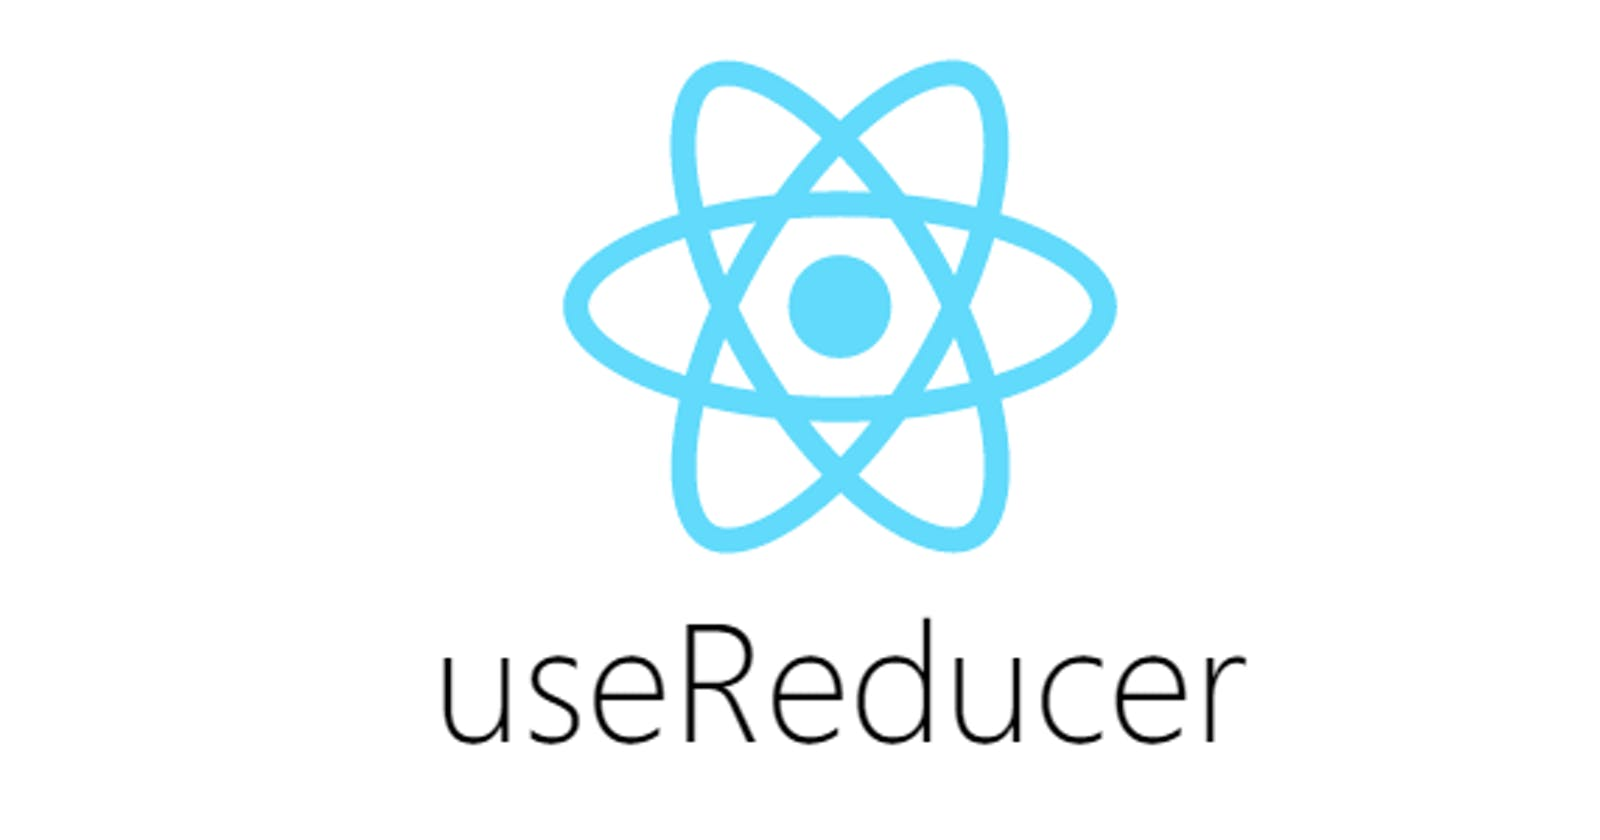 React hook - useReducer - Fetching data